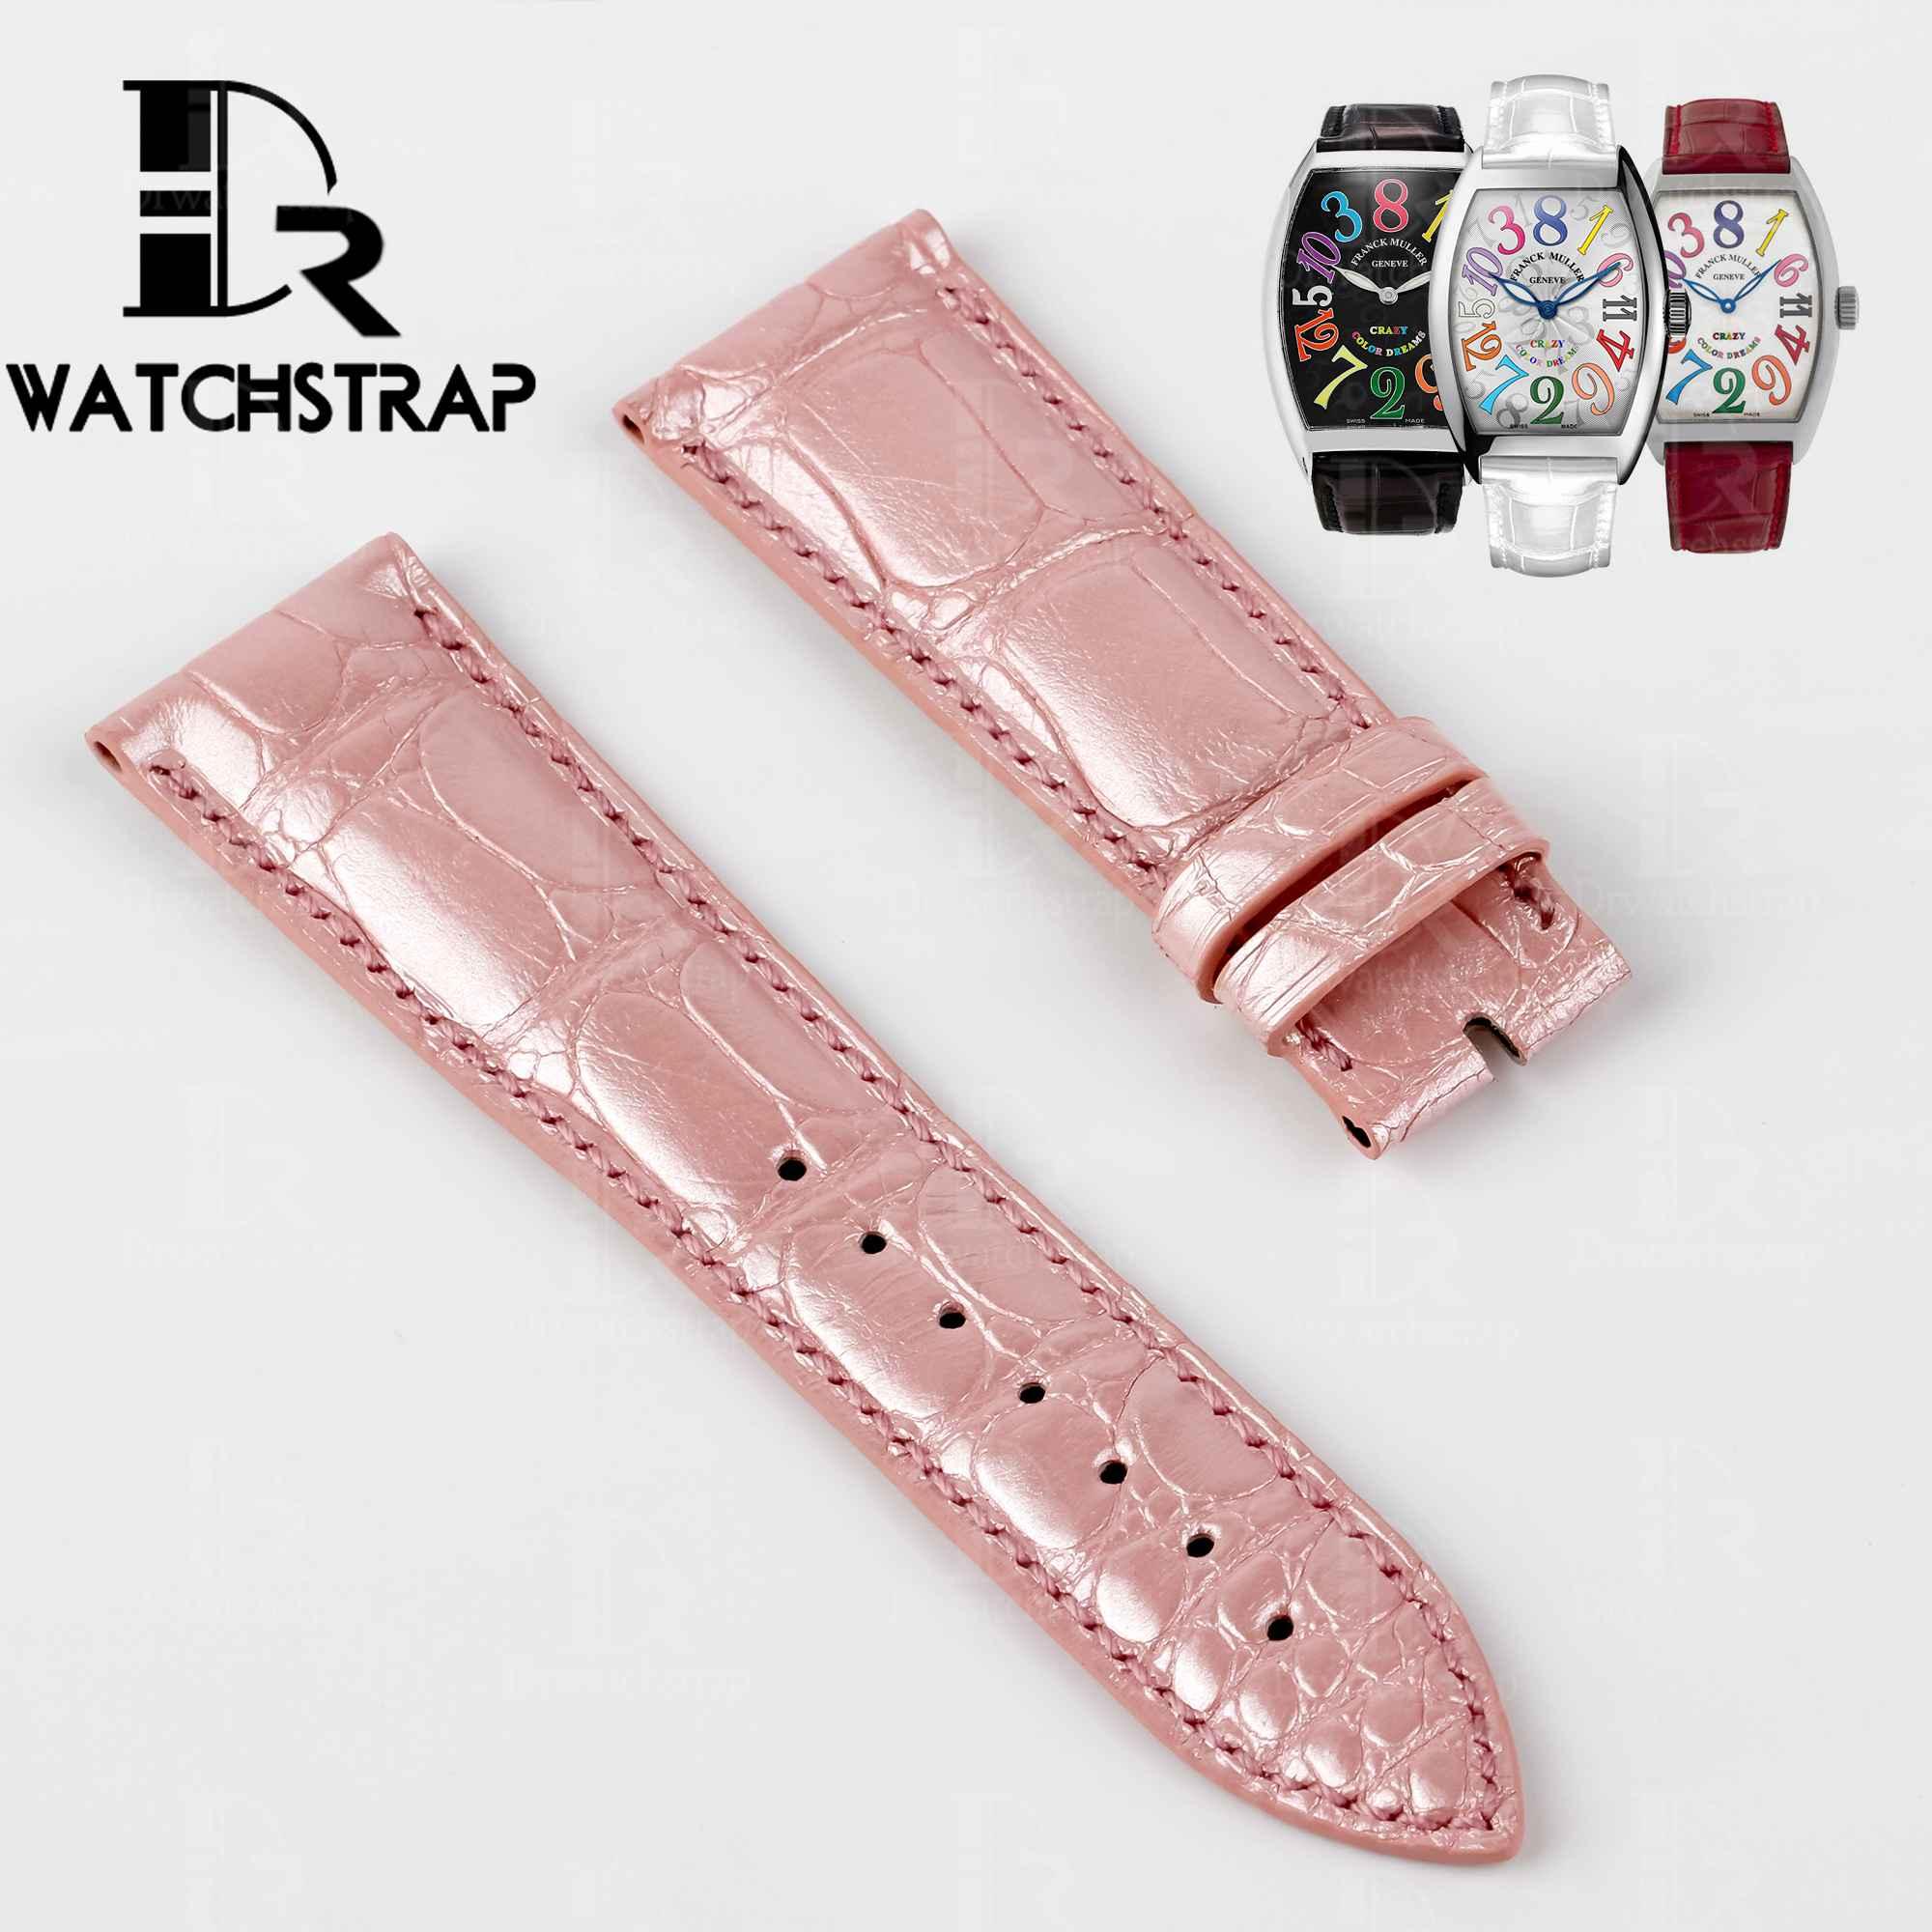 Pink America Alligator leather watch band strap fot Franck Muller CASABLANCA 8880 color dreams wristwatch